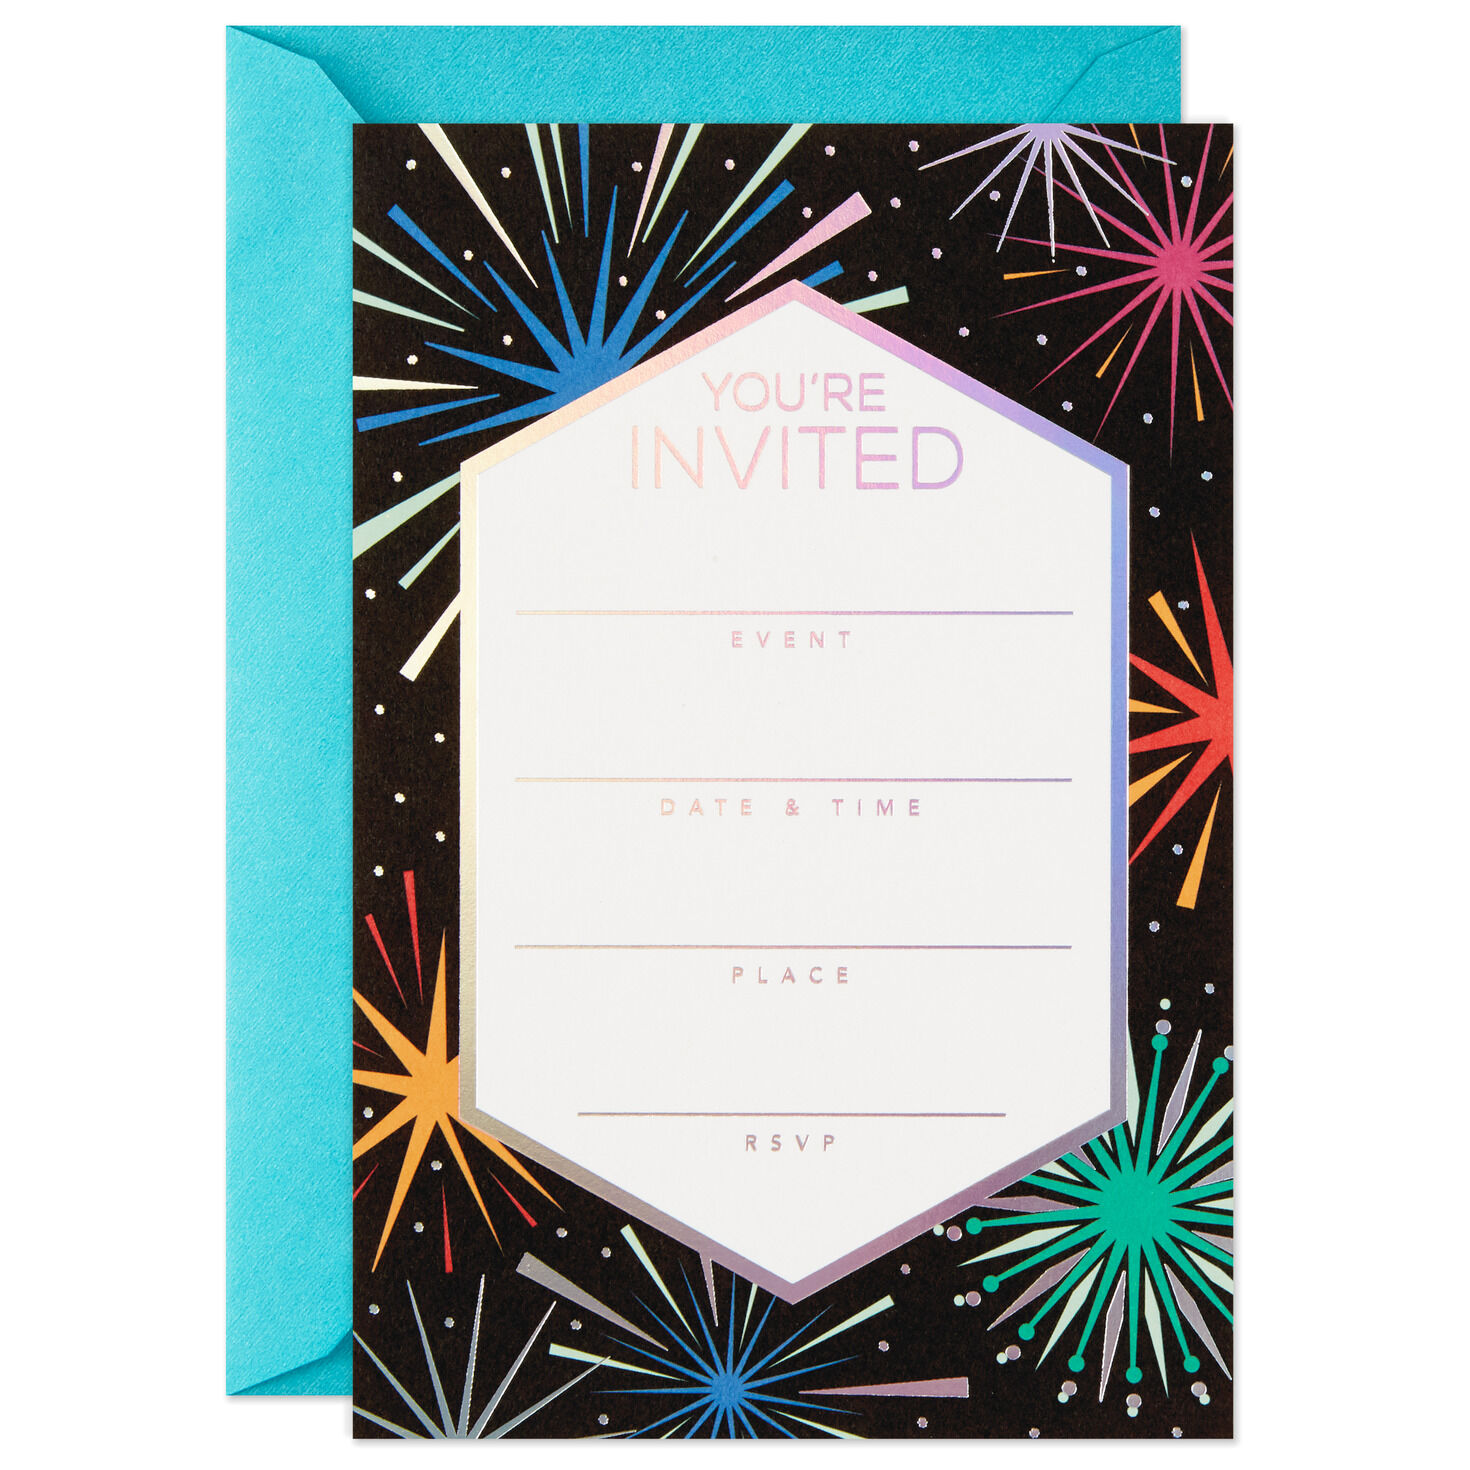 Pack of 10 18th Birthday Invitations Black /& White Flower Pattern